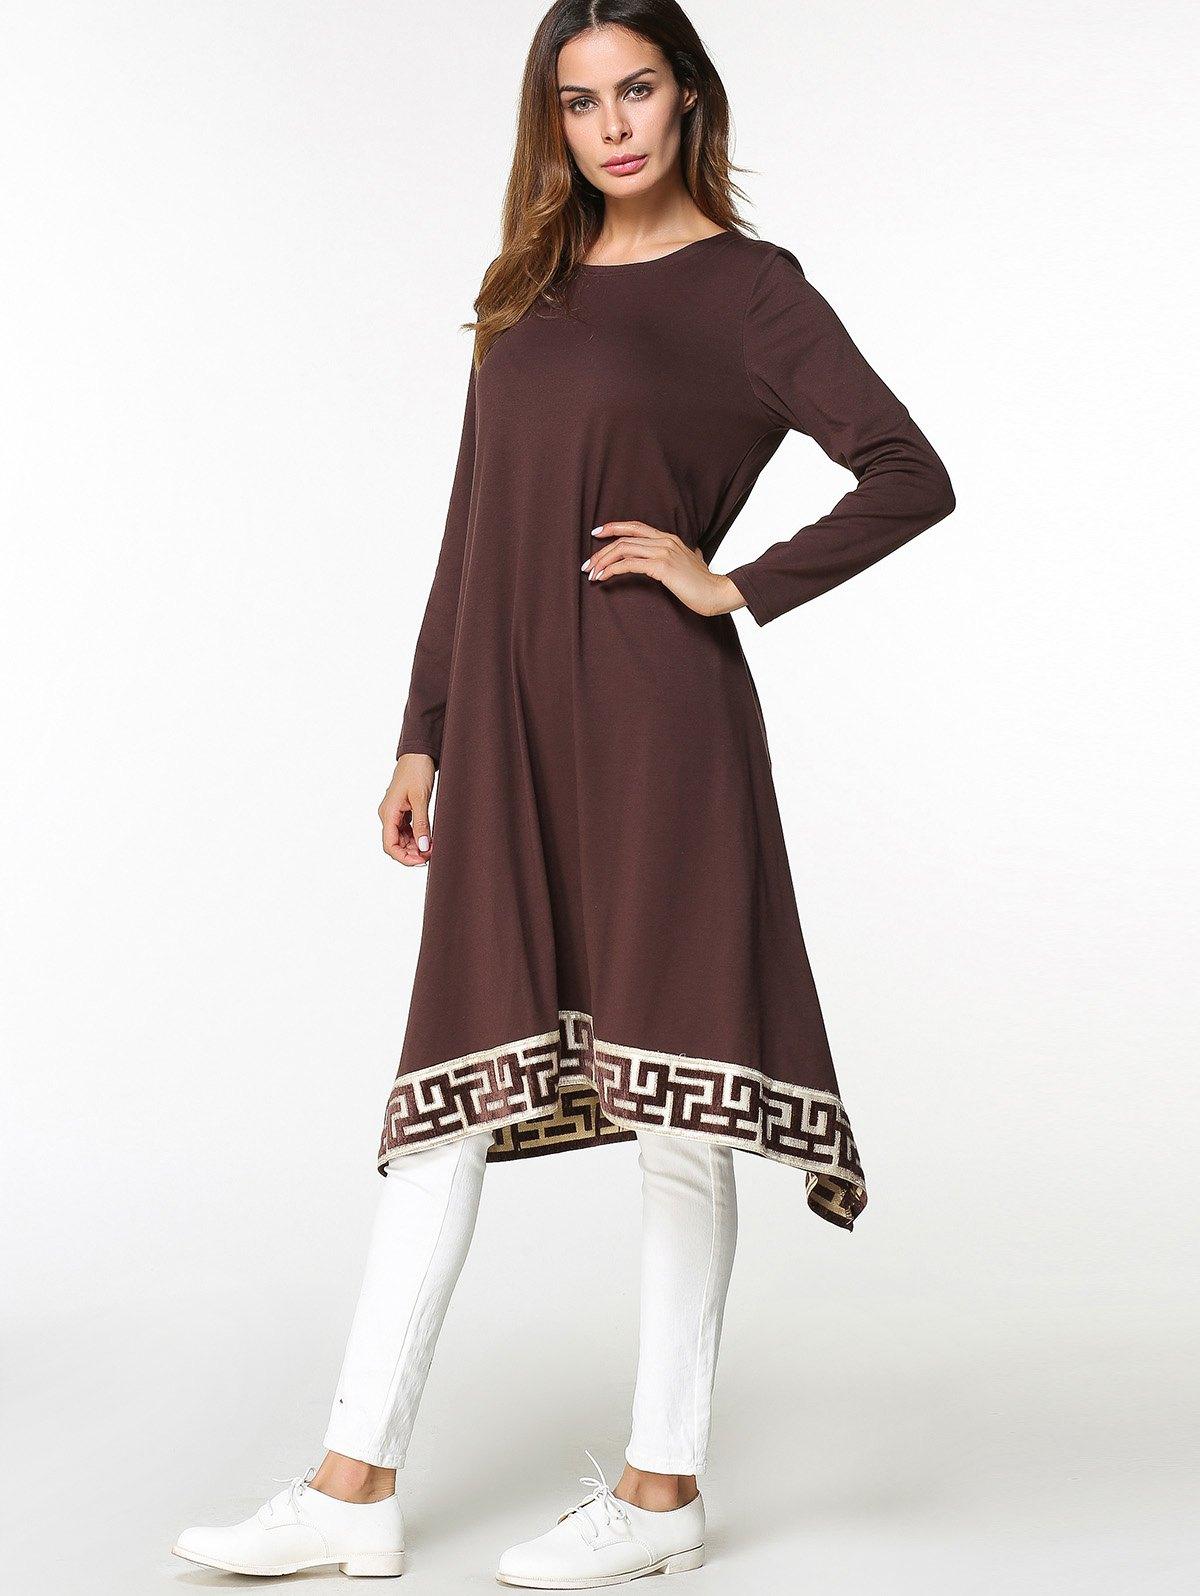 Robes arabe arabe brodées asymétriques